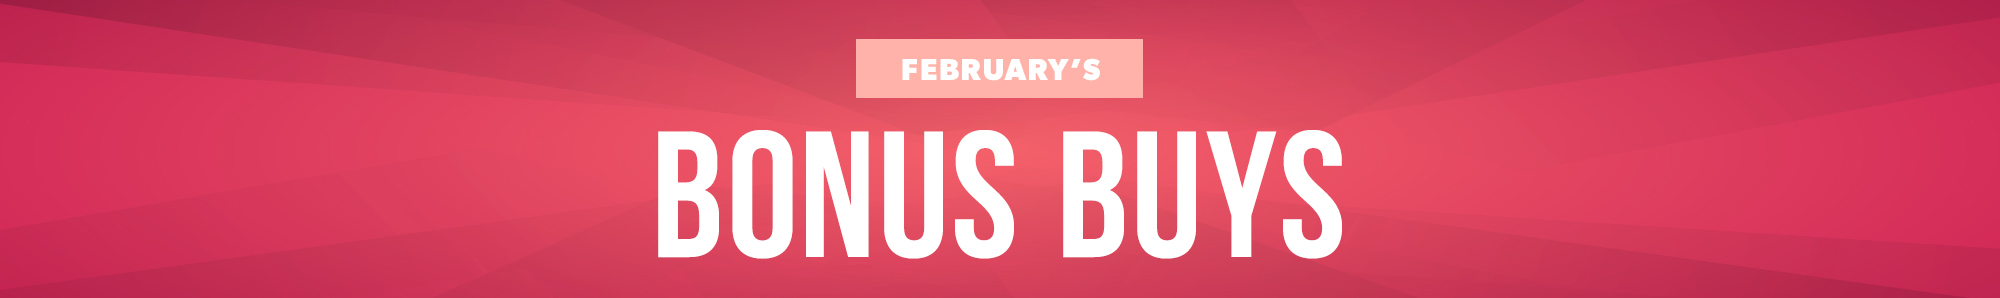 February Deals